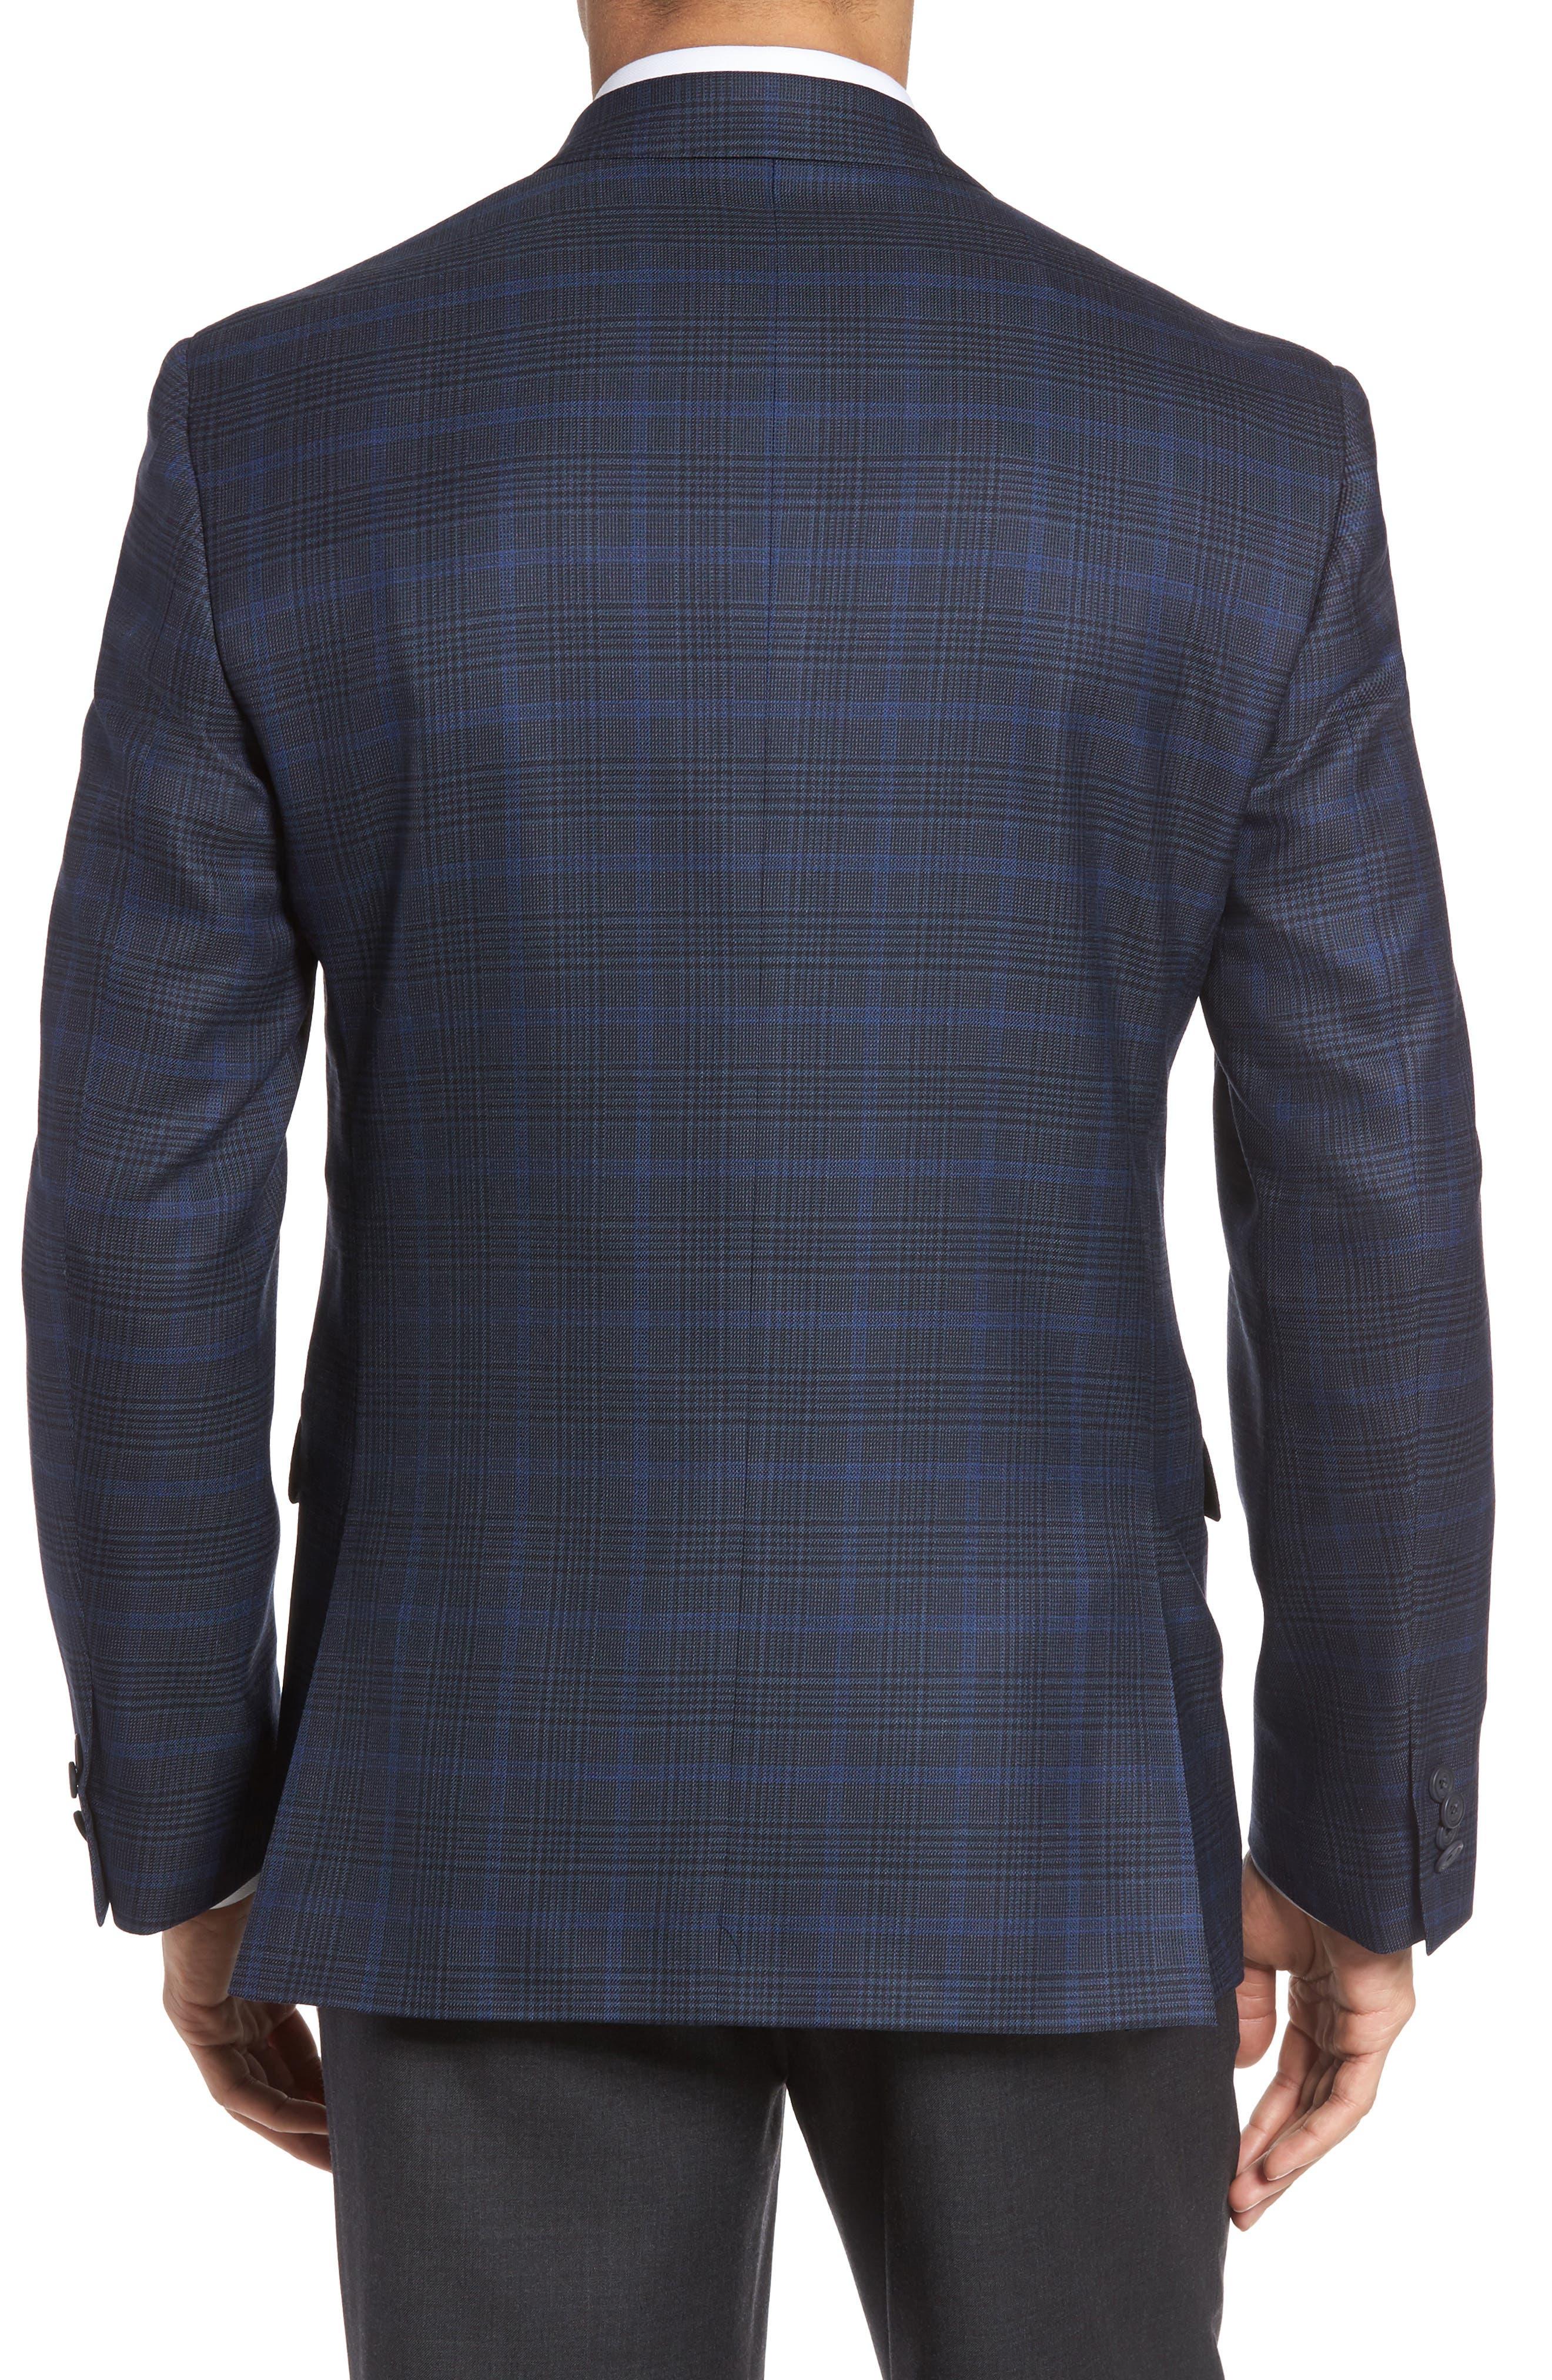 Alternate Image 2  - JB Britches Classic Fit Plaid Wool Sport Coat